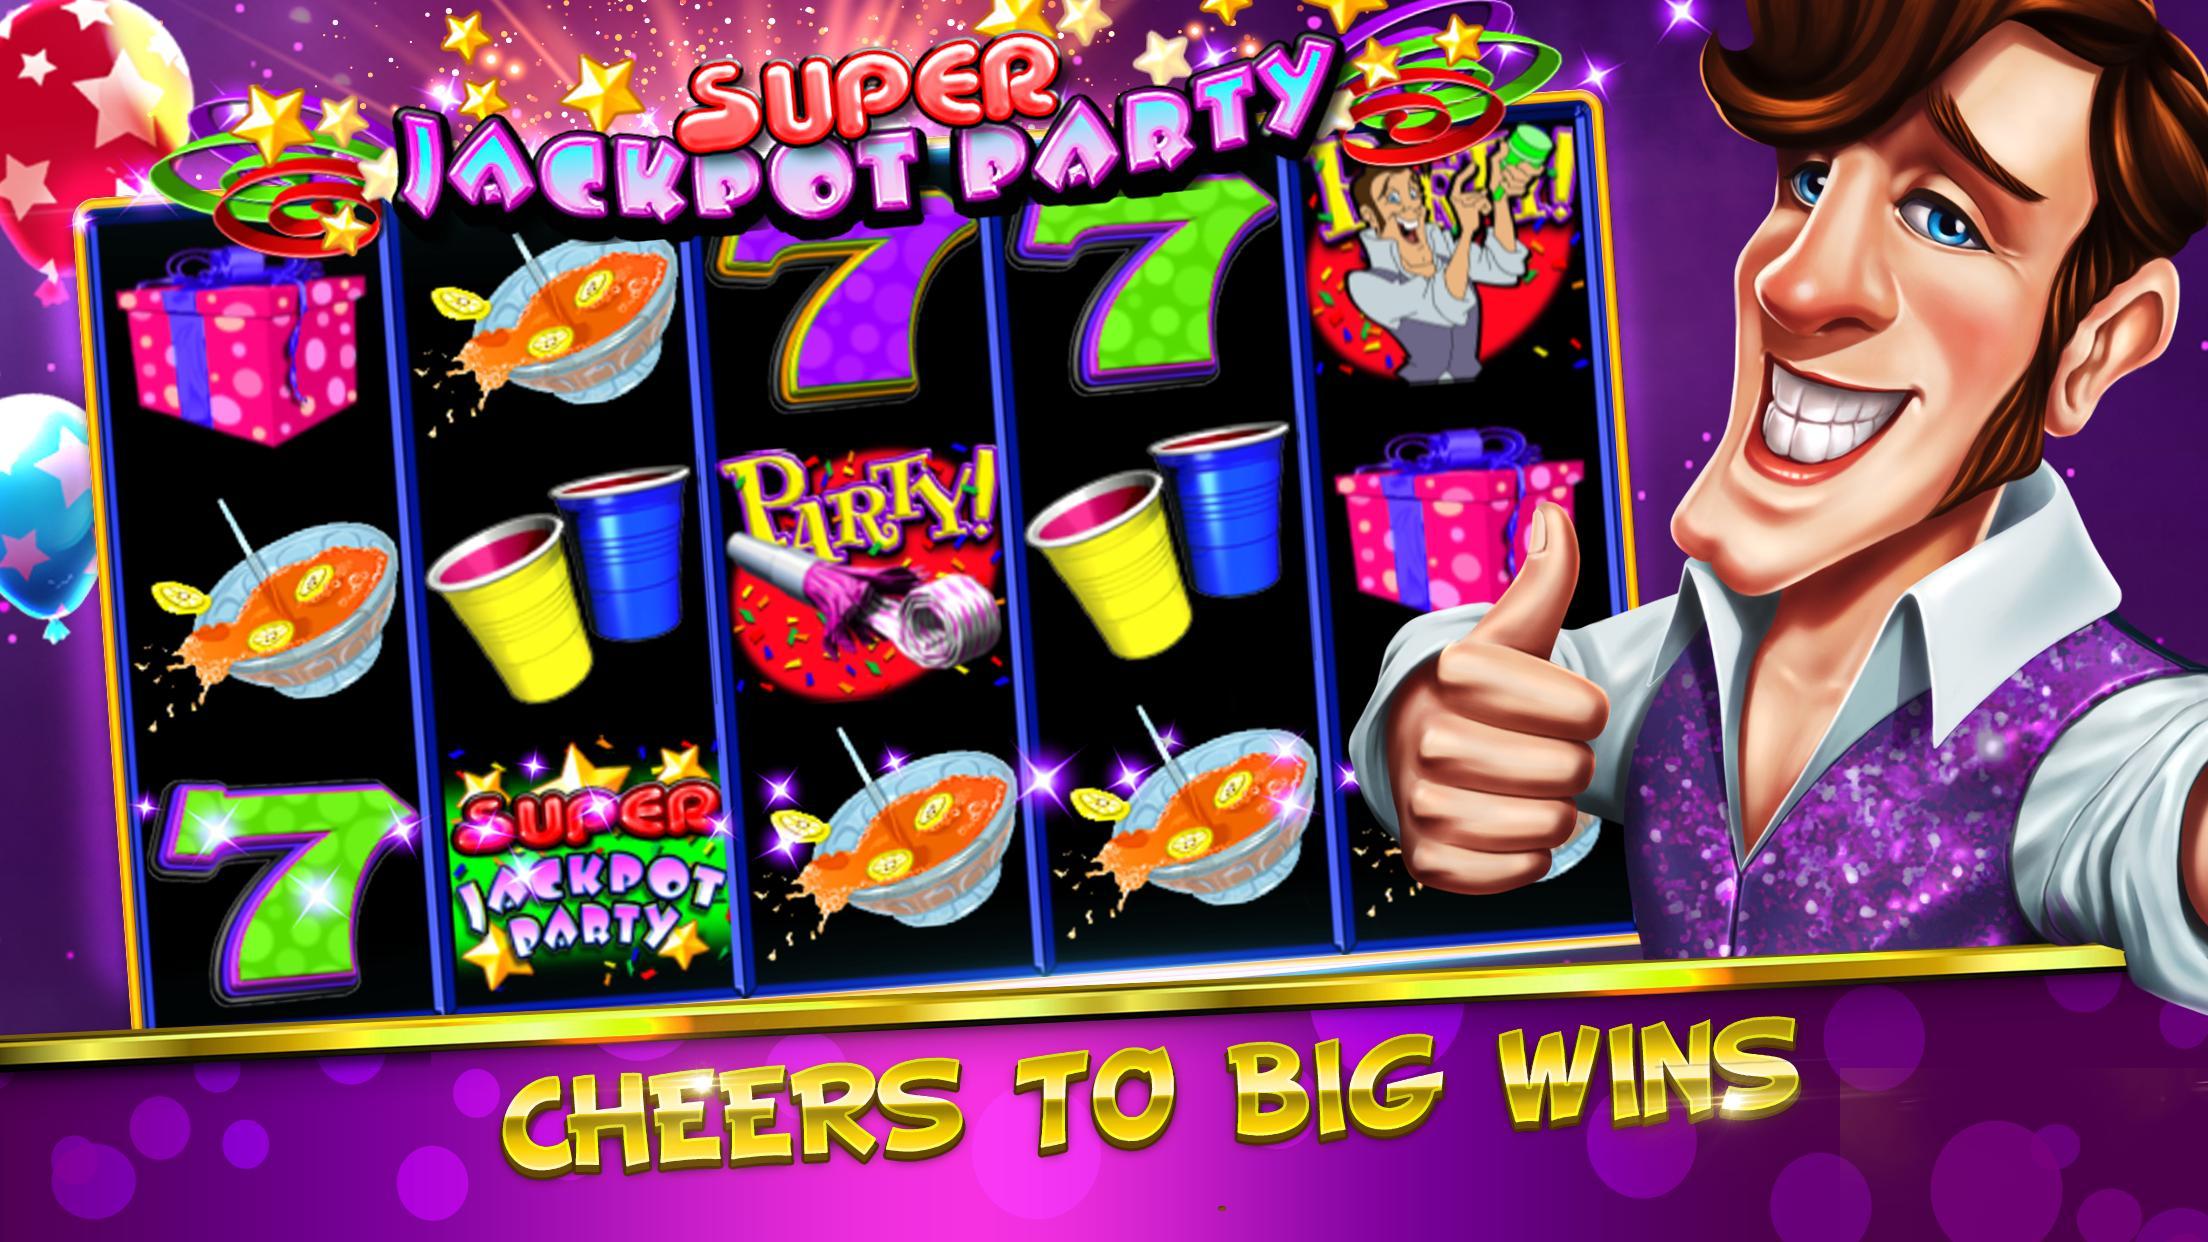 Jackpot Win Celebration at Party Casino